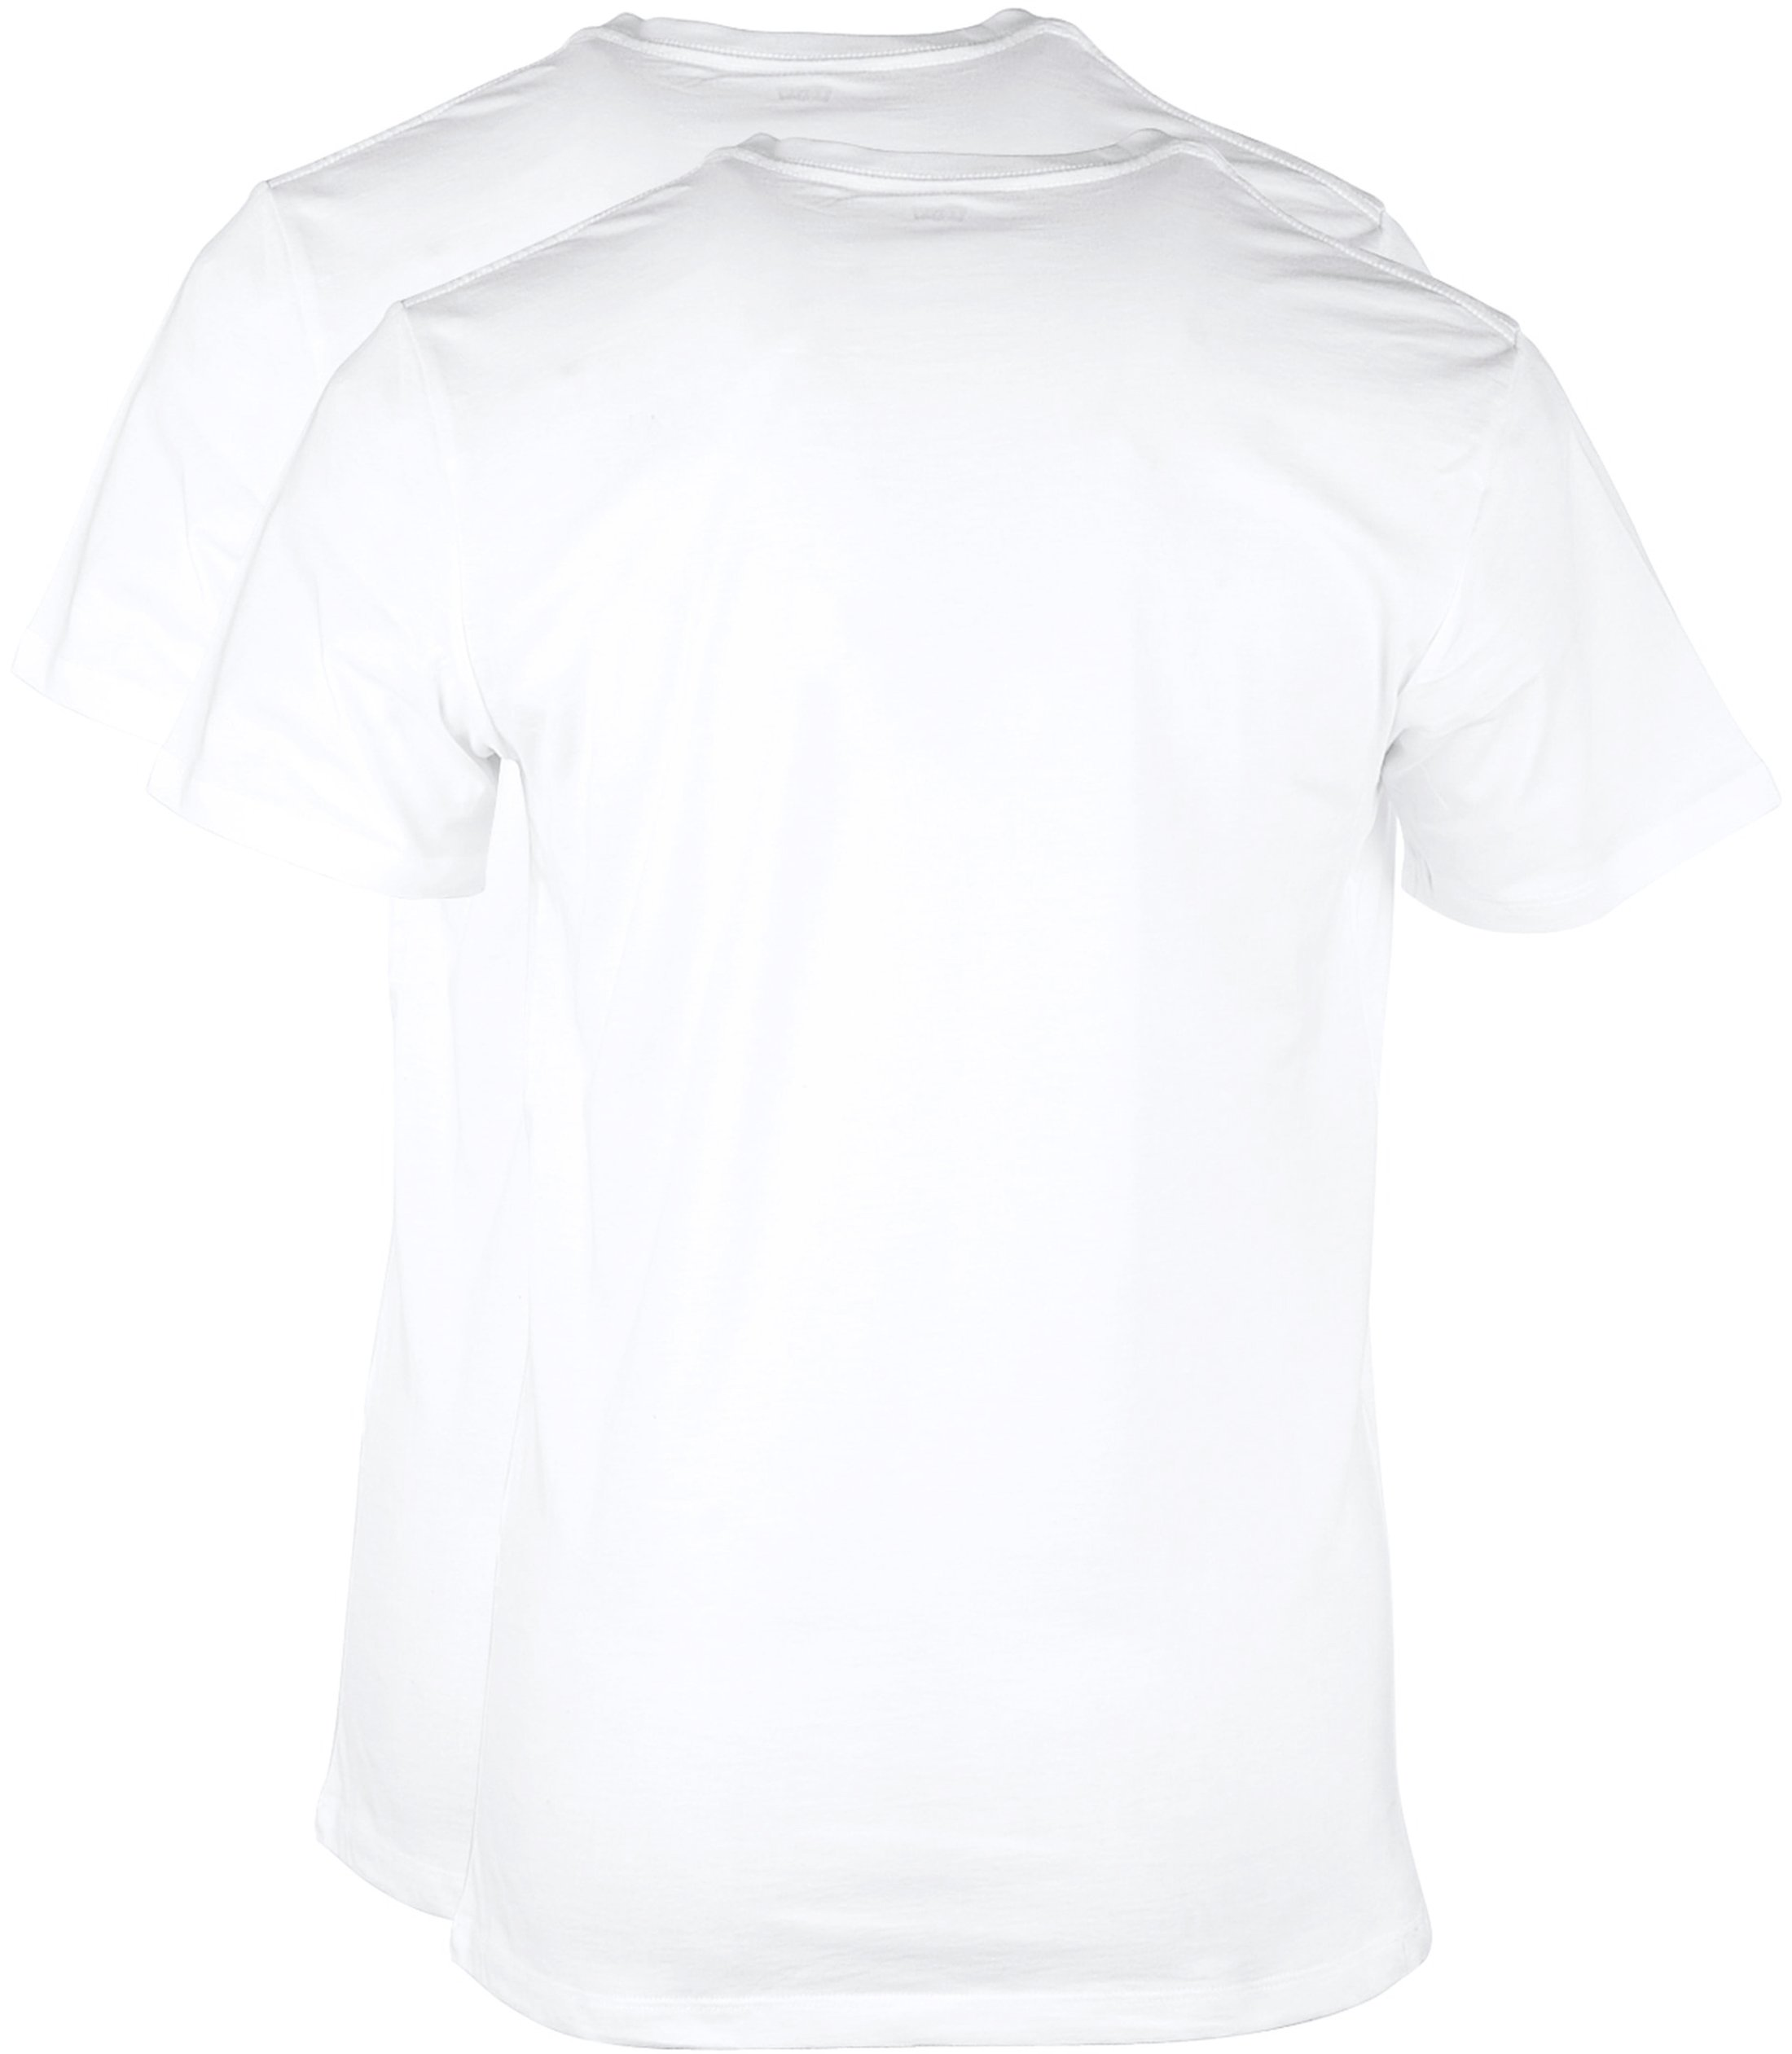 Levi's T-shirt V-Hals Wit 2Pack foto 2